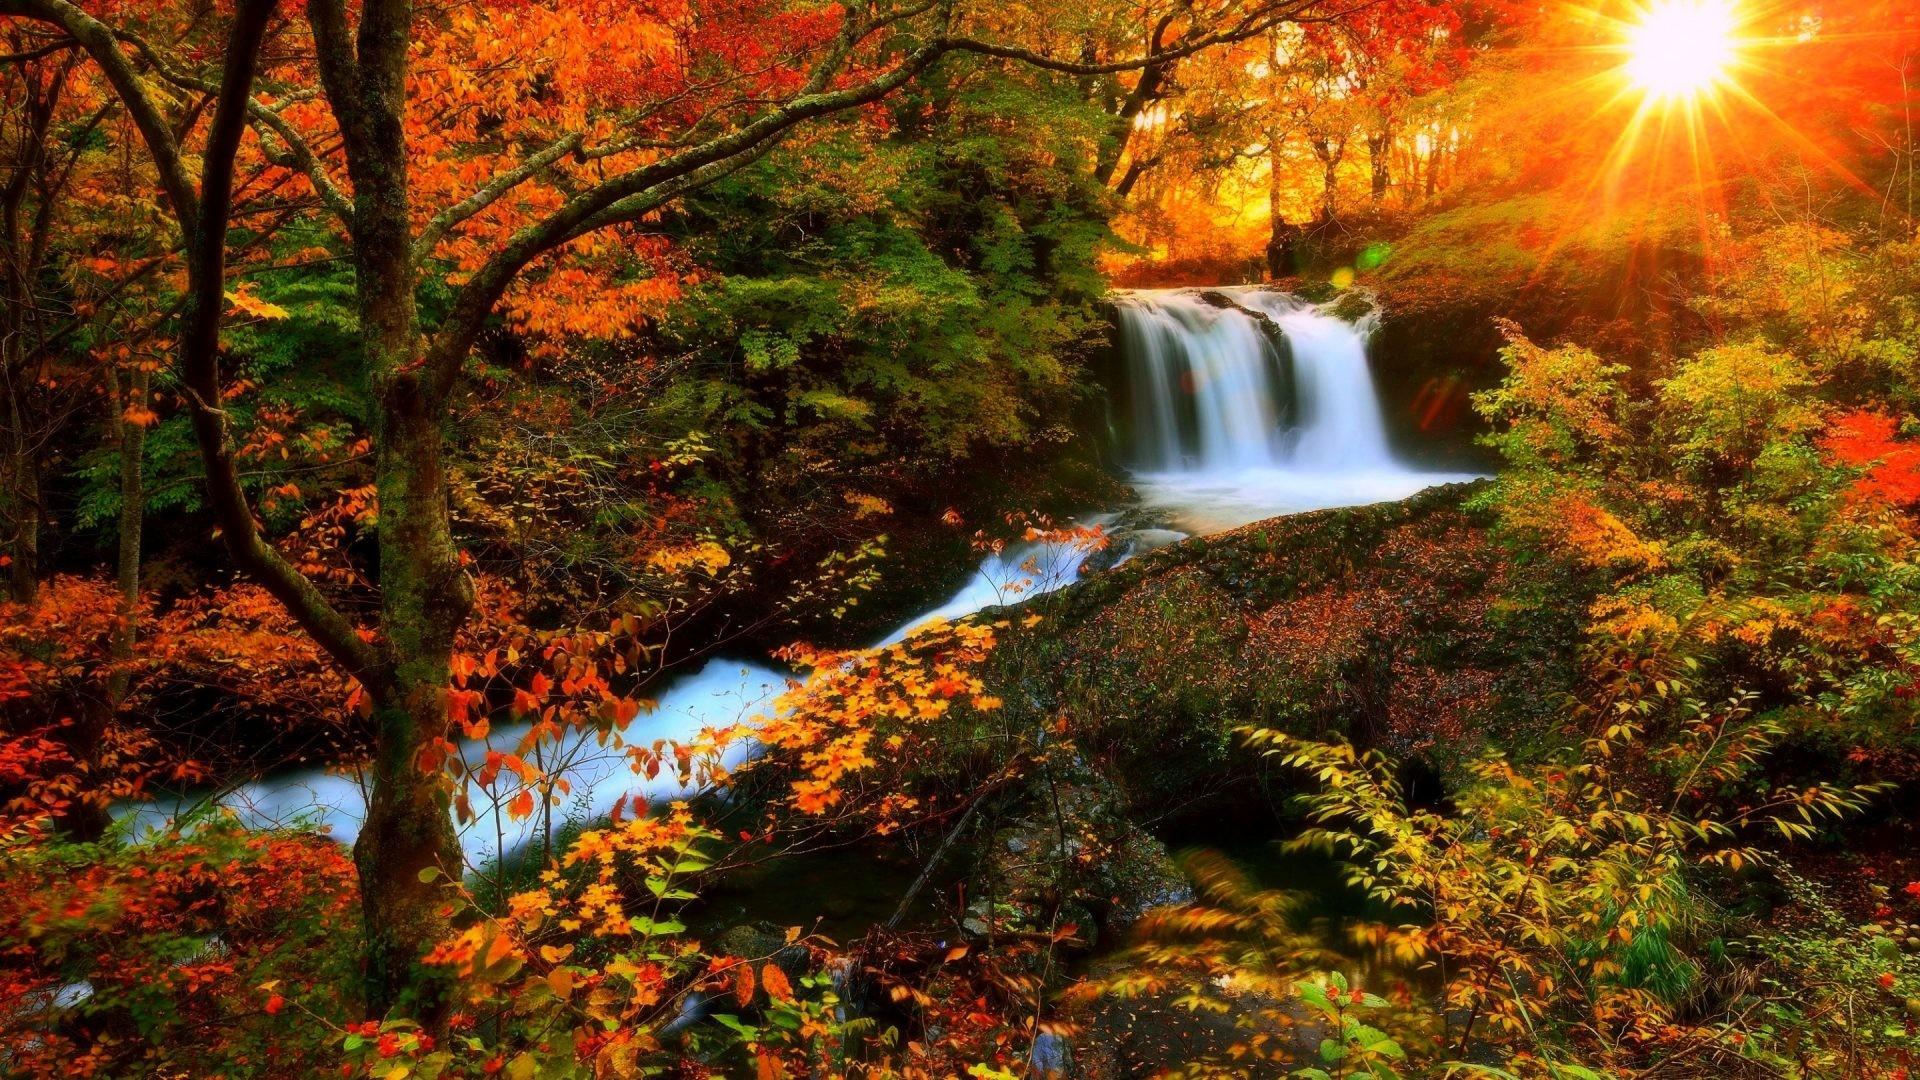 Waterfalls – Autumn Waterfalls Photography Sunlight Love Seasons Sunshine  Attractions Dreams Creative Pre Colors Stunning Falls